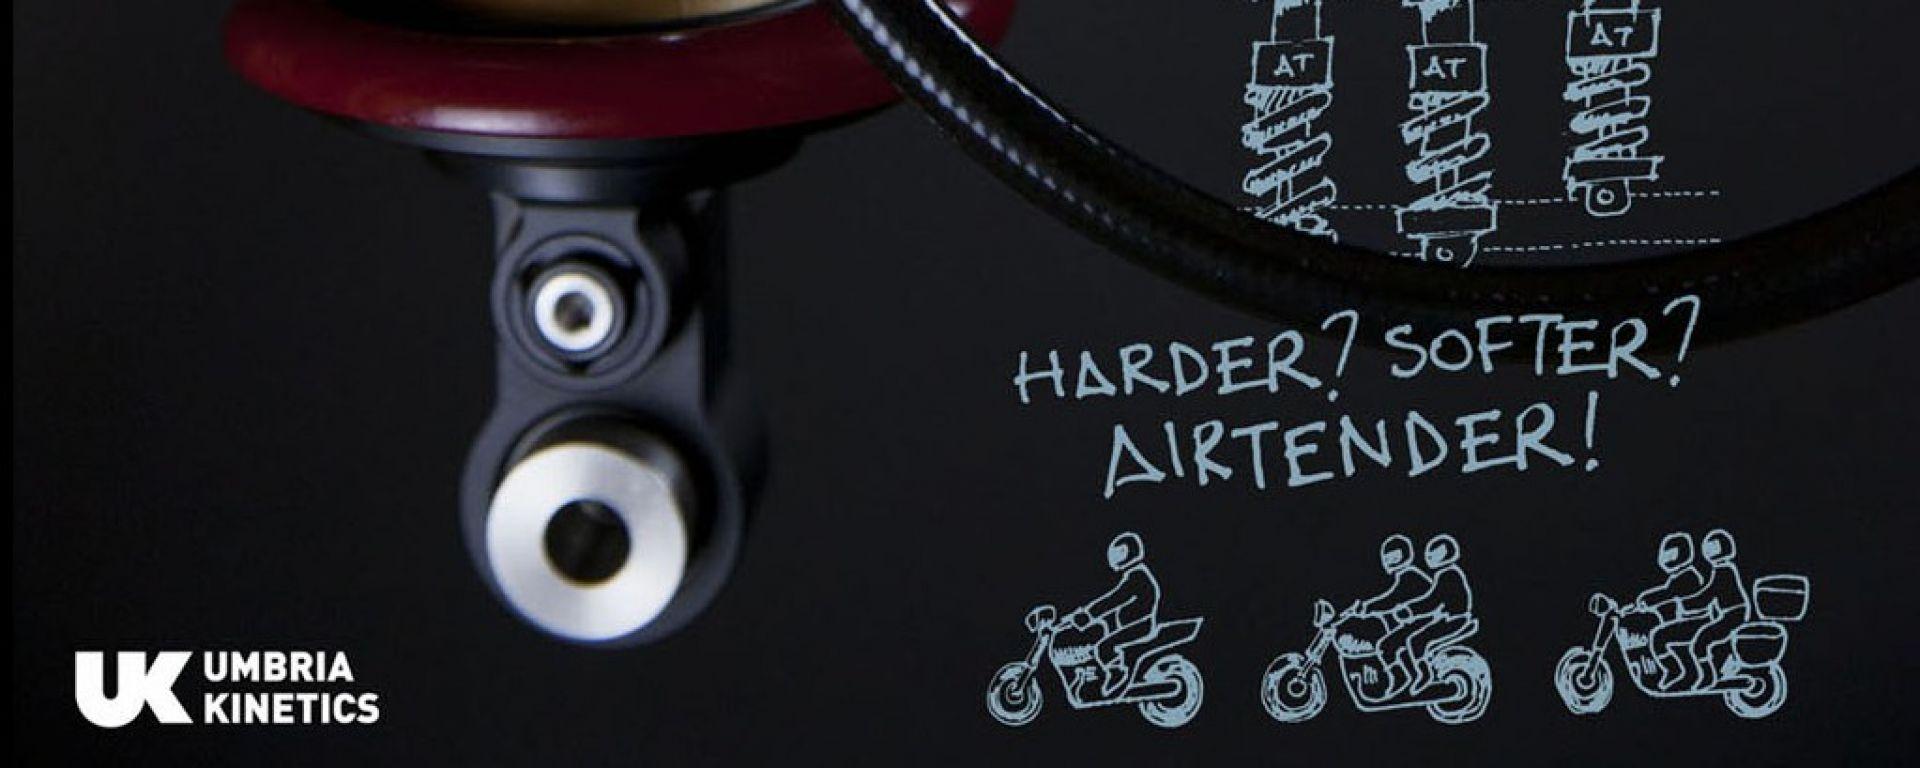 AIRTENDER BY UMBRIA KINETICS